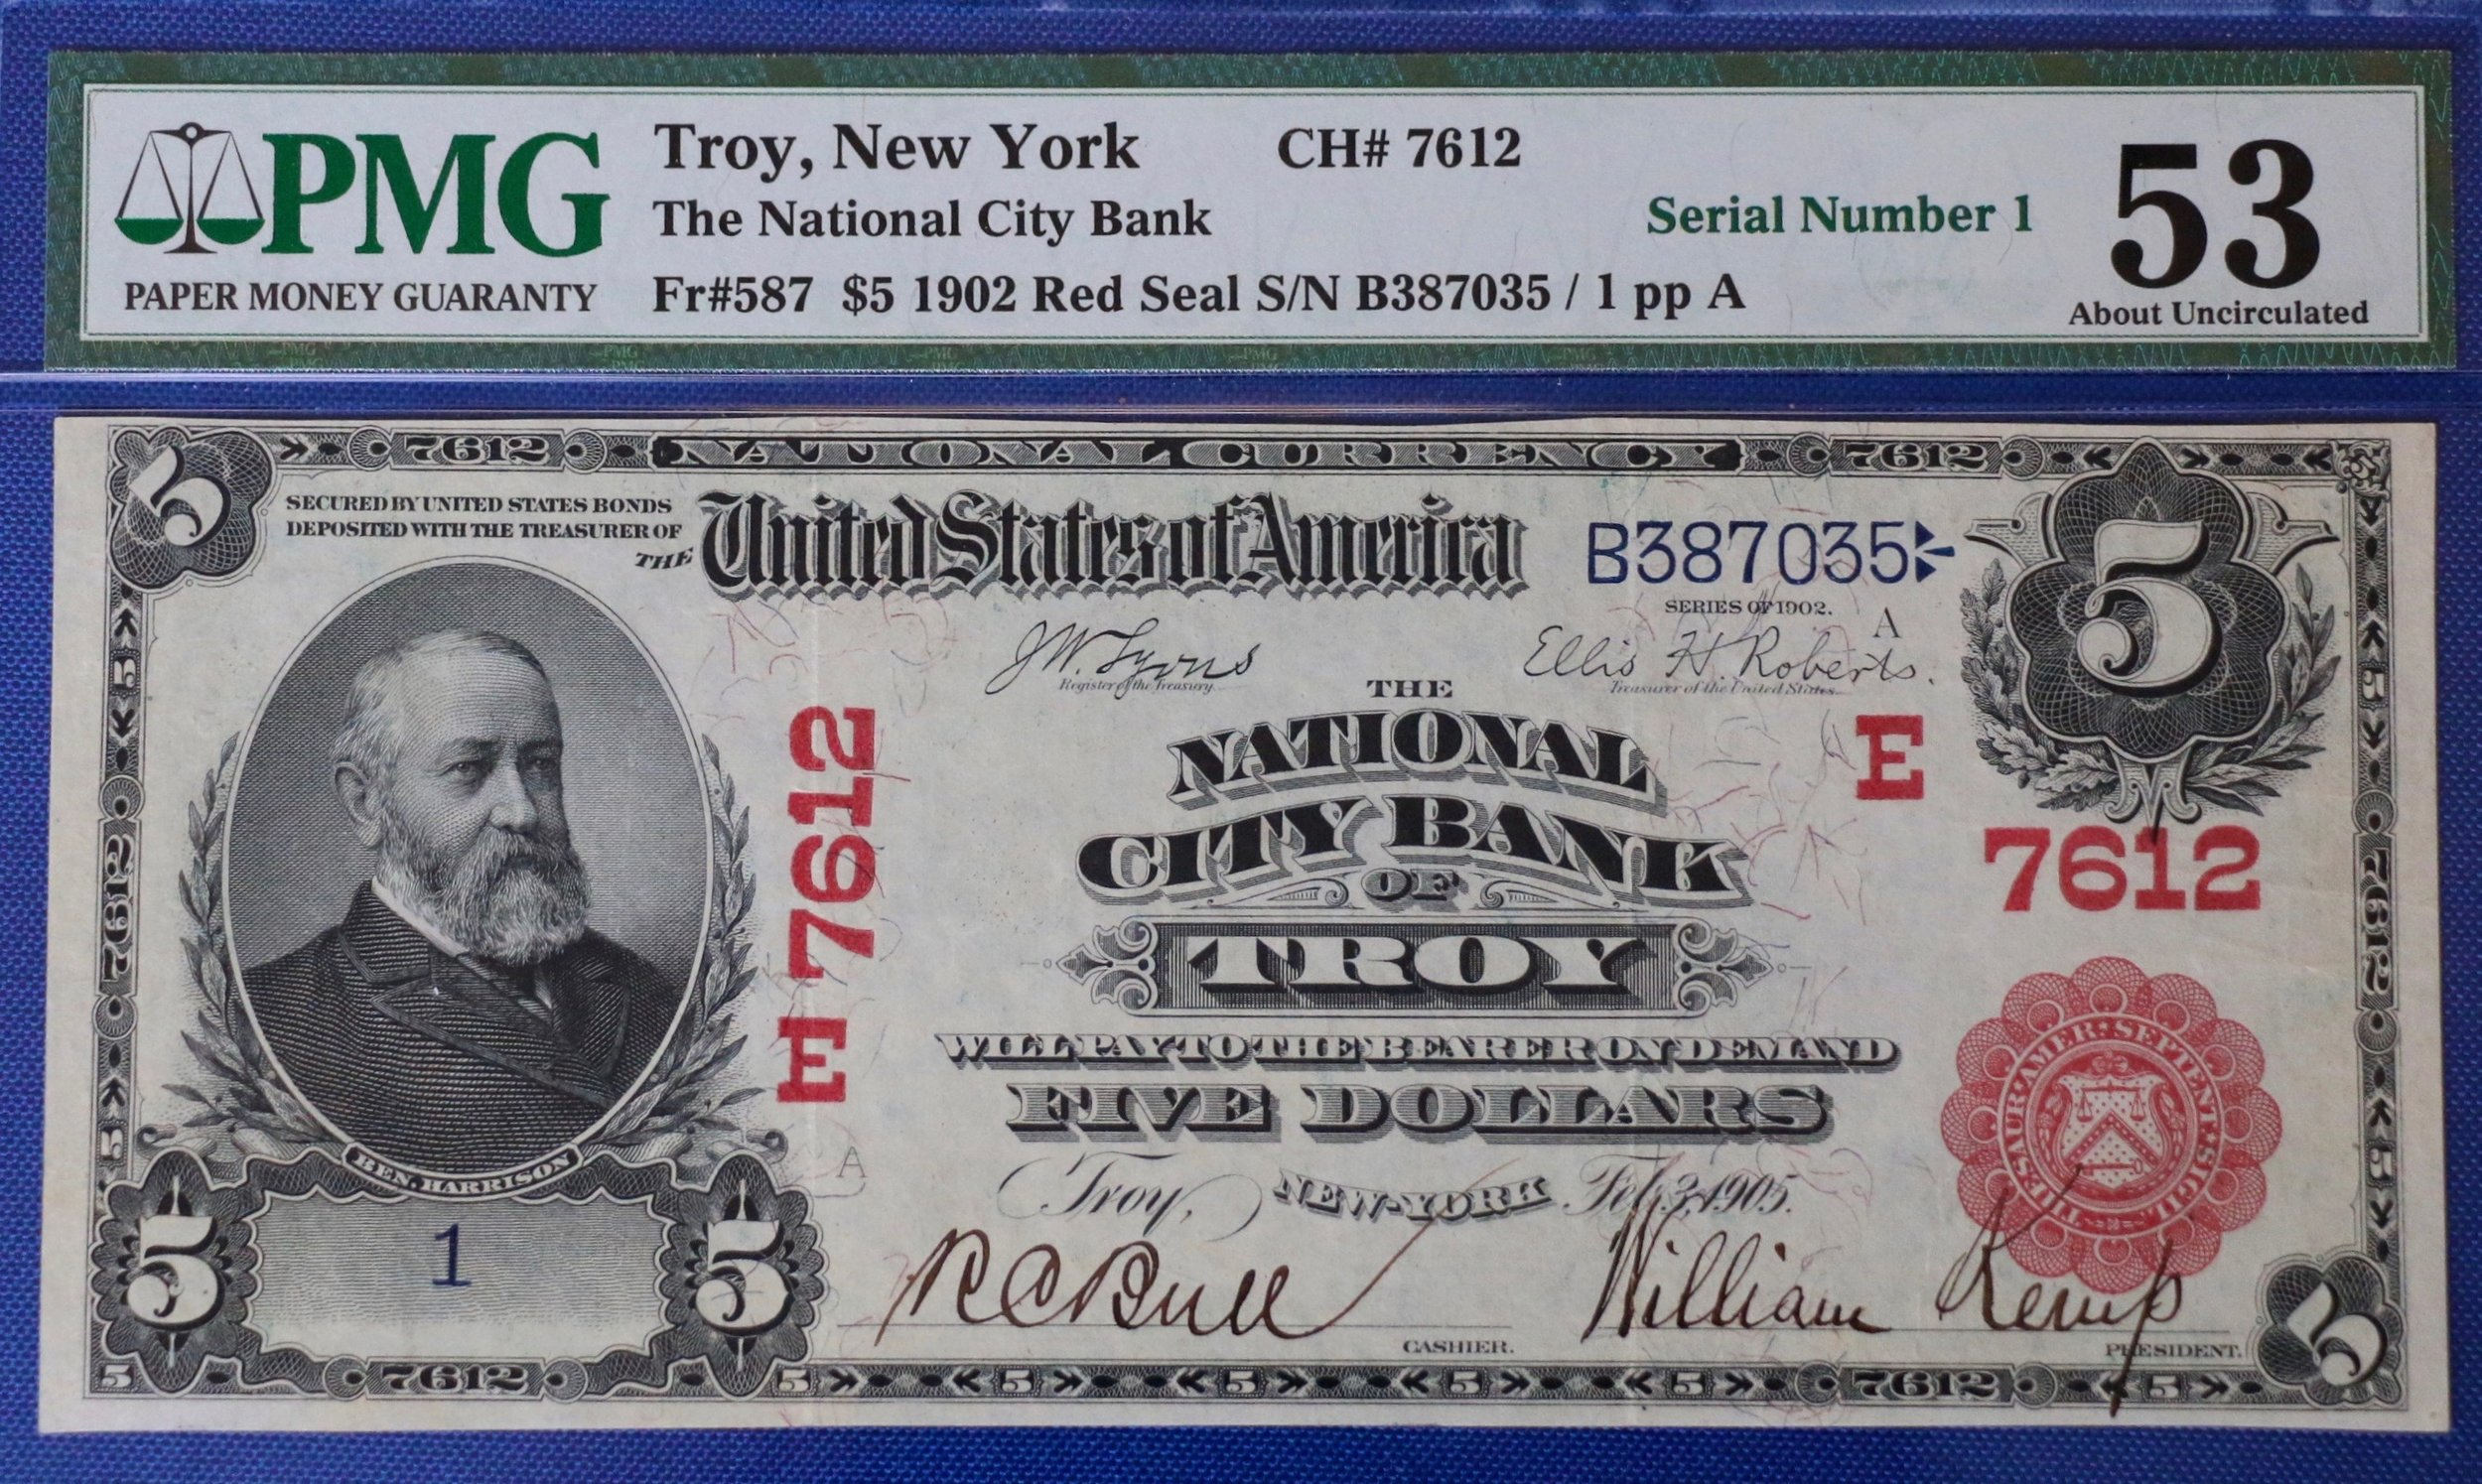 03-TroyNationalCity-$5-Ferris_Coin copy.jpg